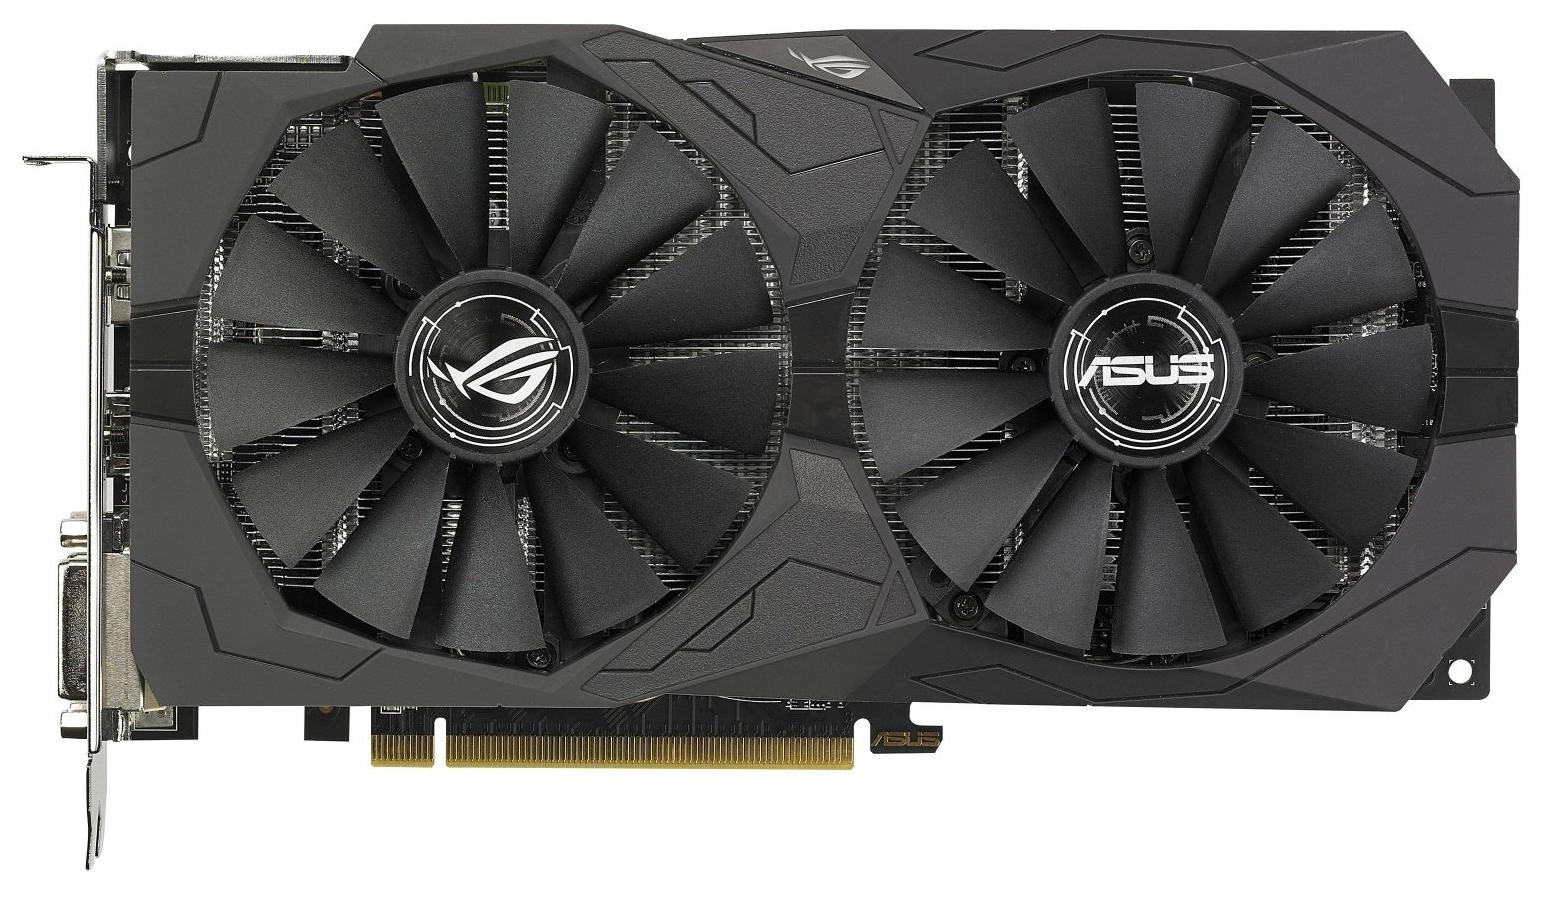 Видеокарта ASUS ROG Strix Radeon RX 570 (ROG-STRIX-RX570-O4G-GAMING)